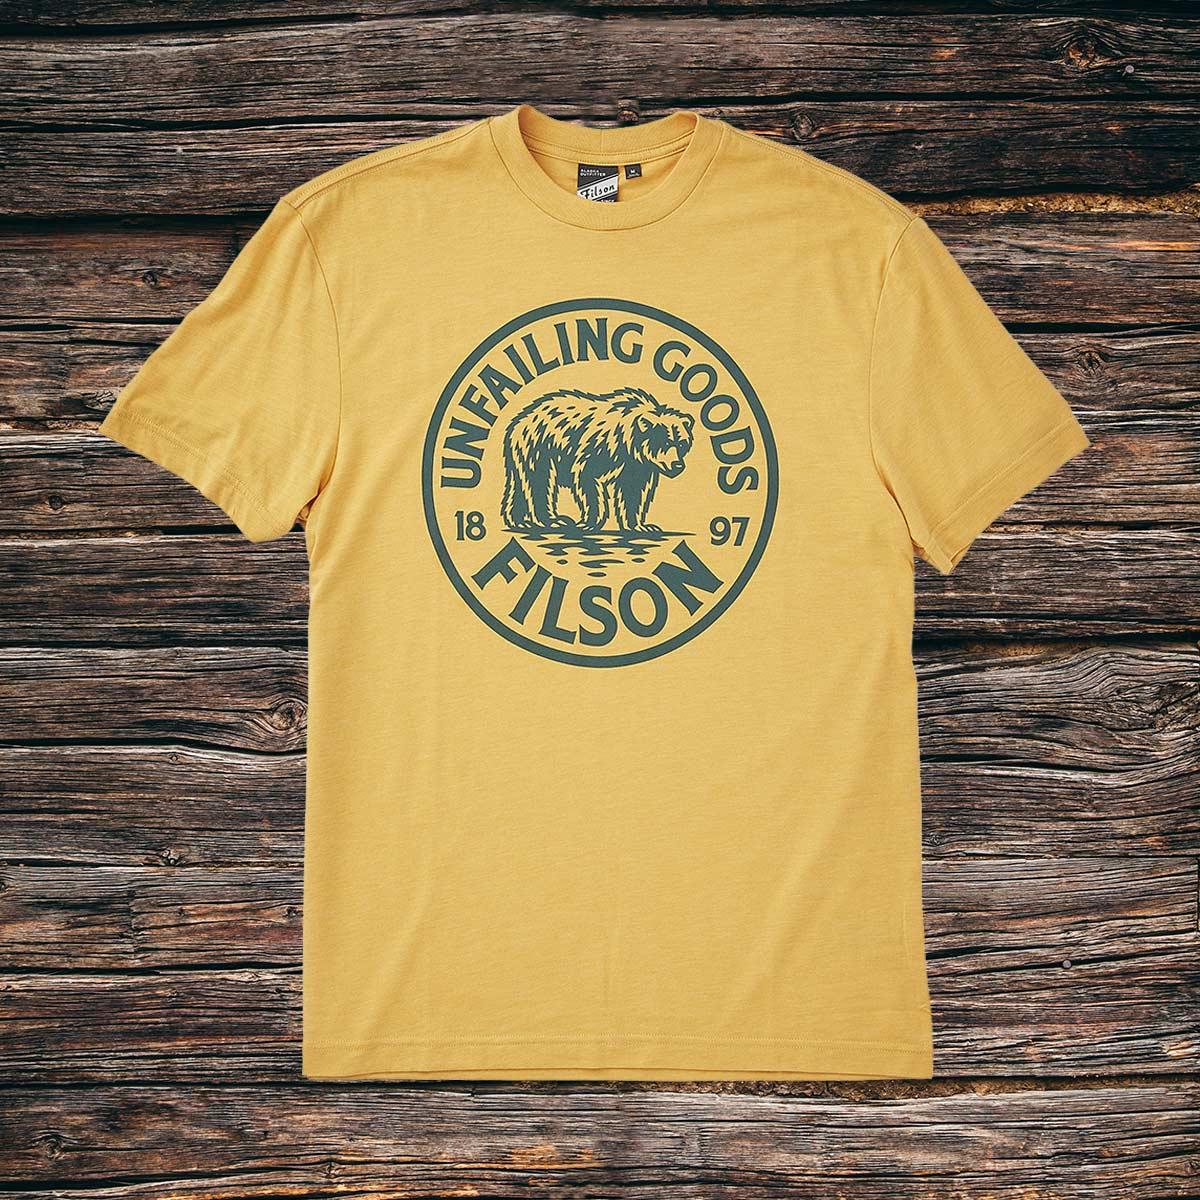 Filson Buckshot T-Shirt Rye, hoogwaardig T-shirt met UPF 50+ zonwering